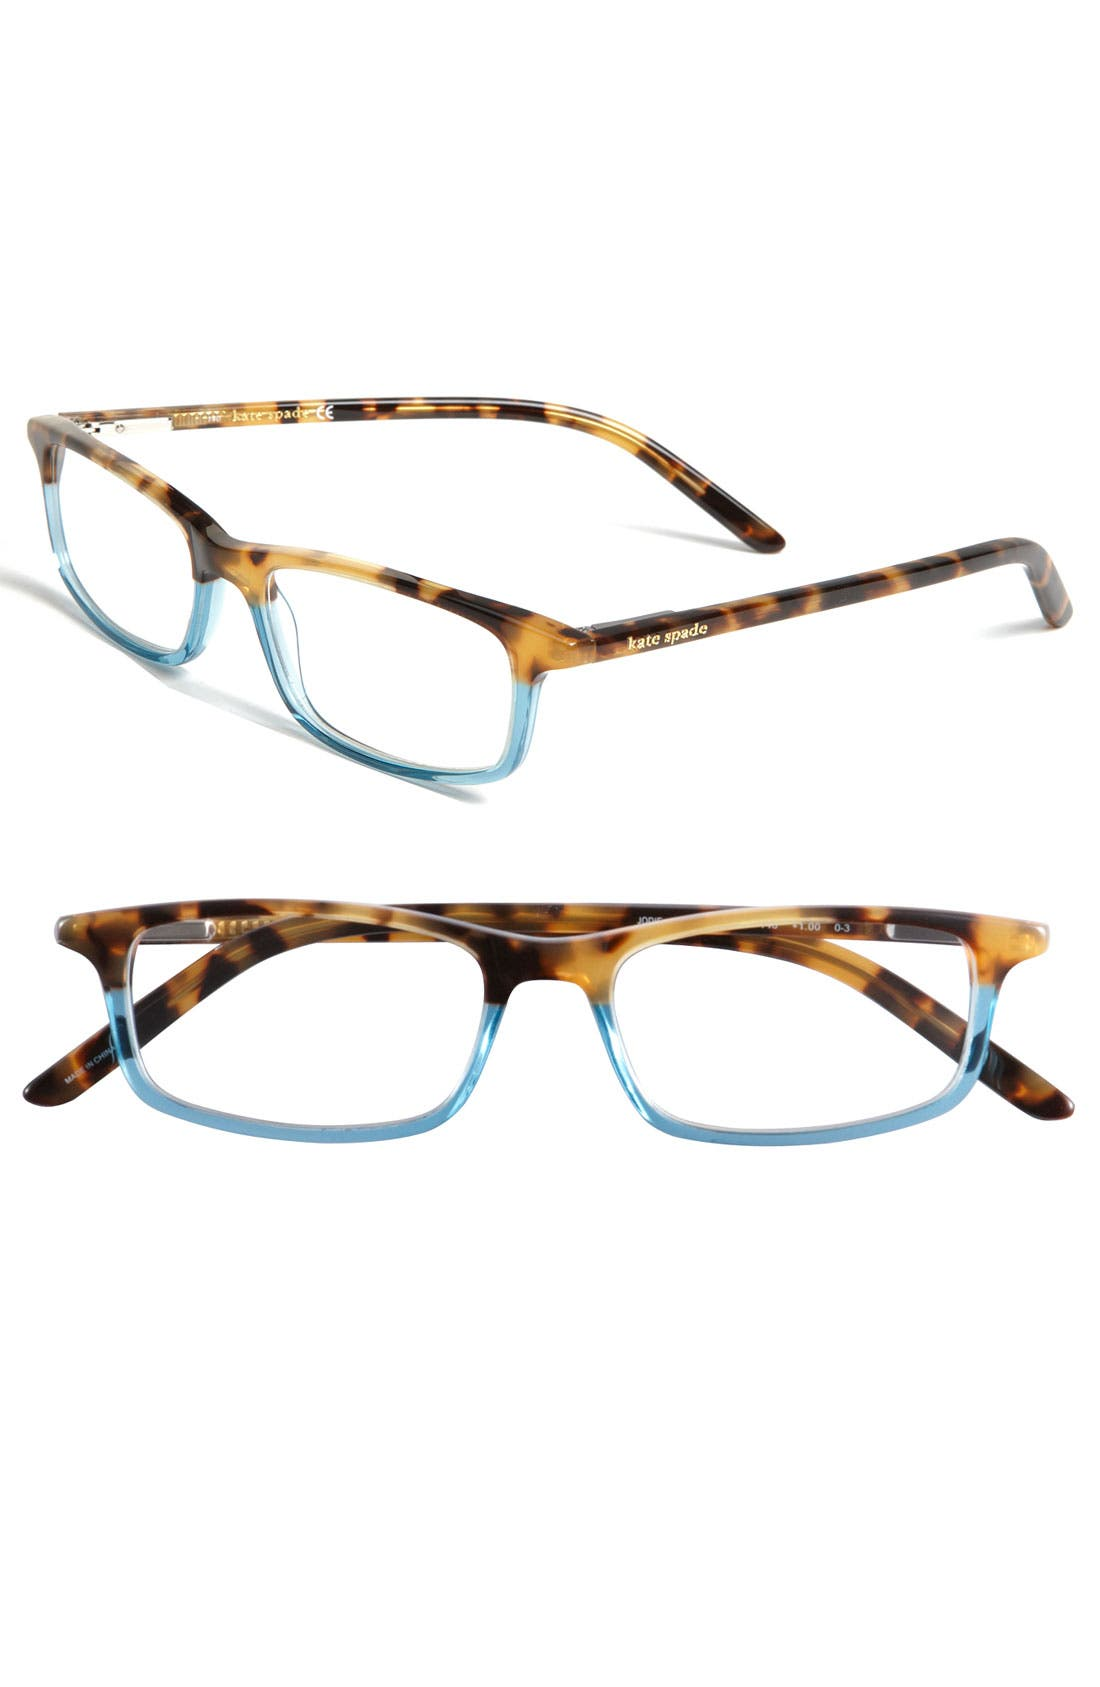 kate spade new york jodie 50mm reading glasses